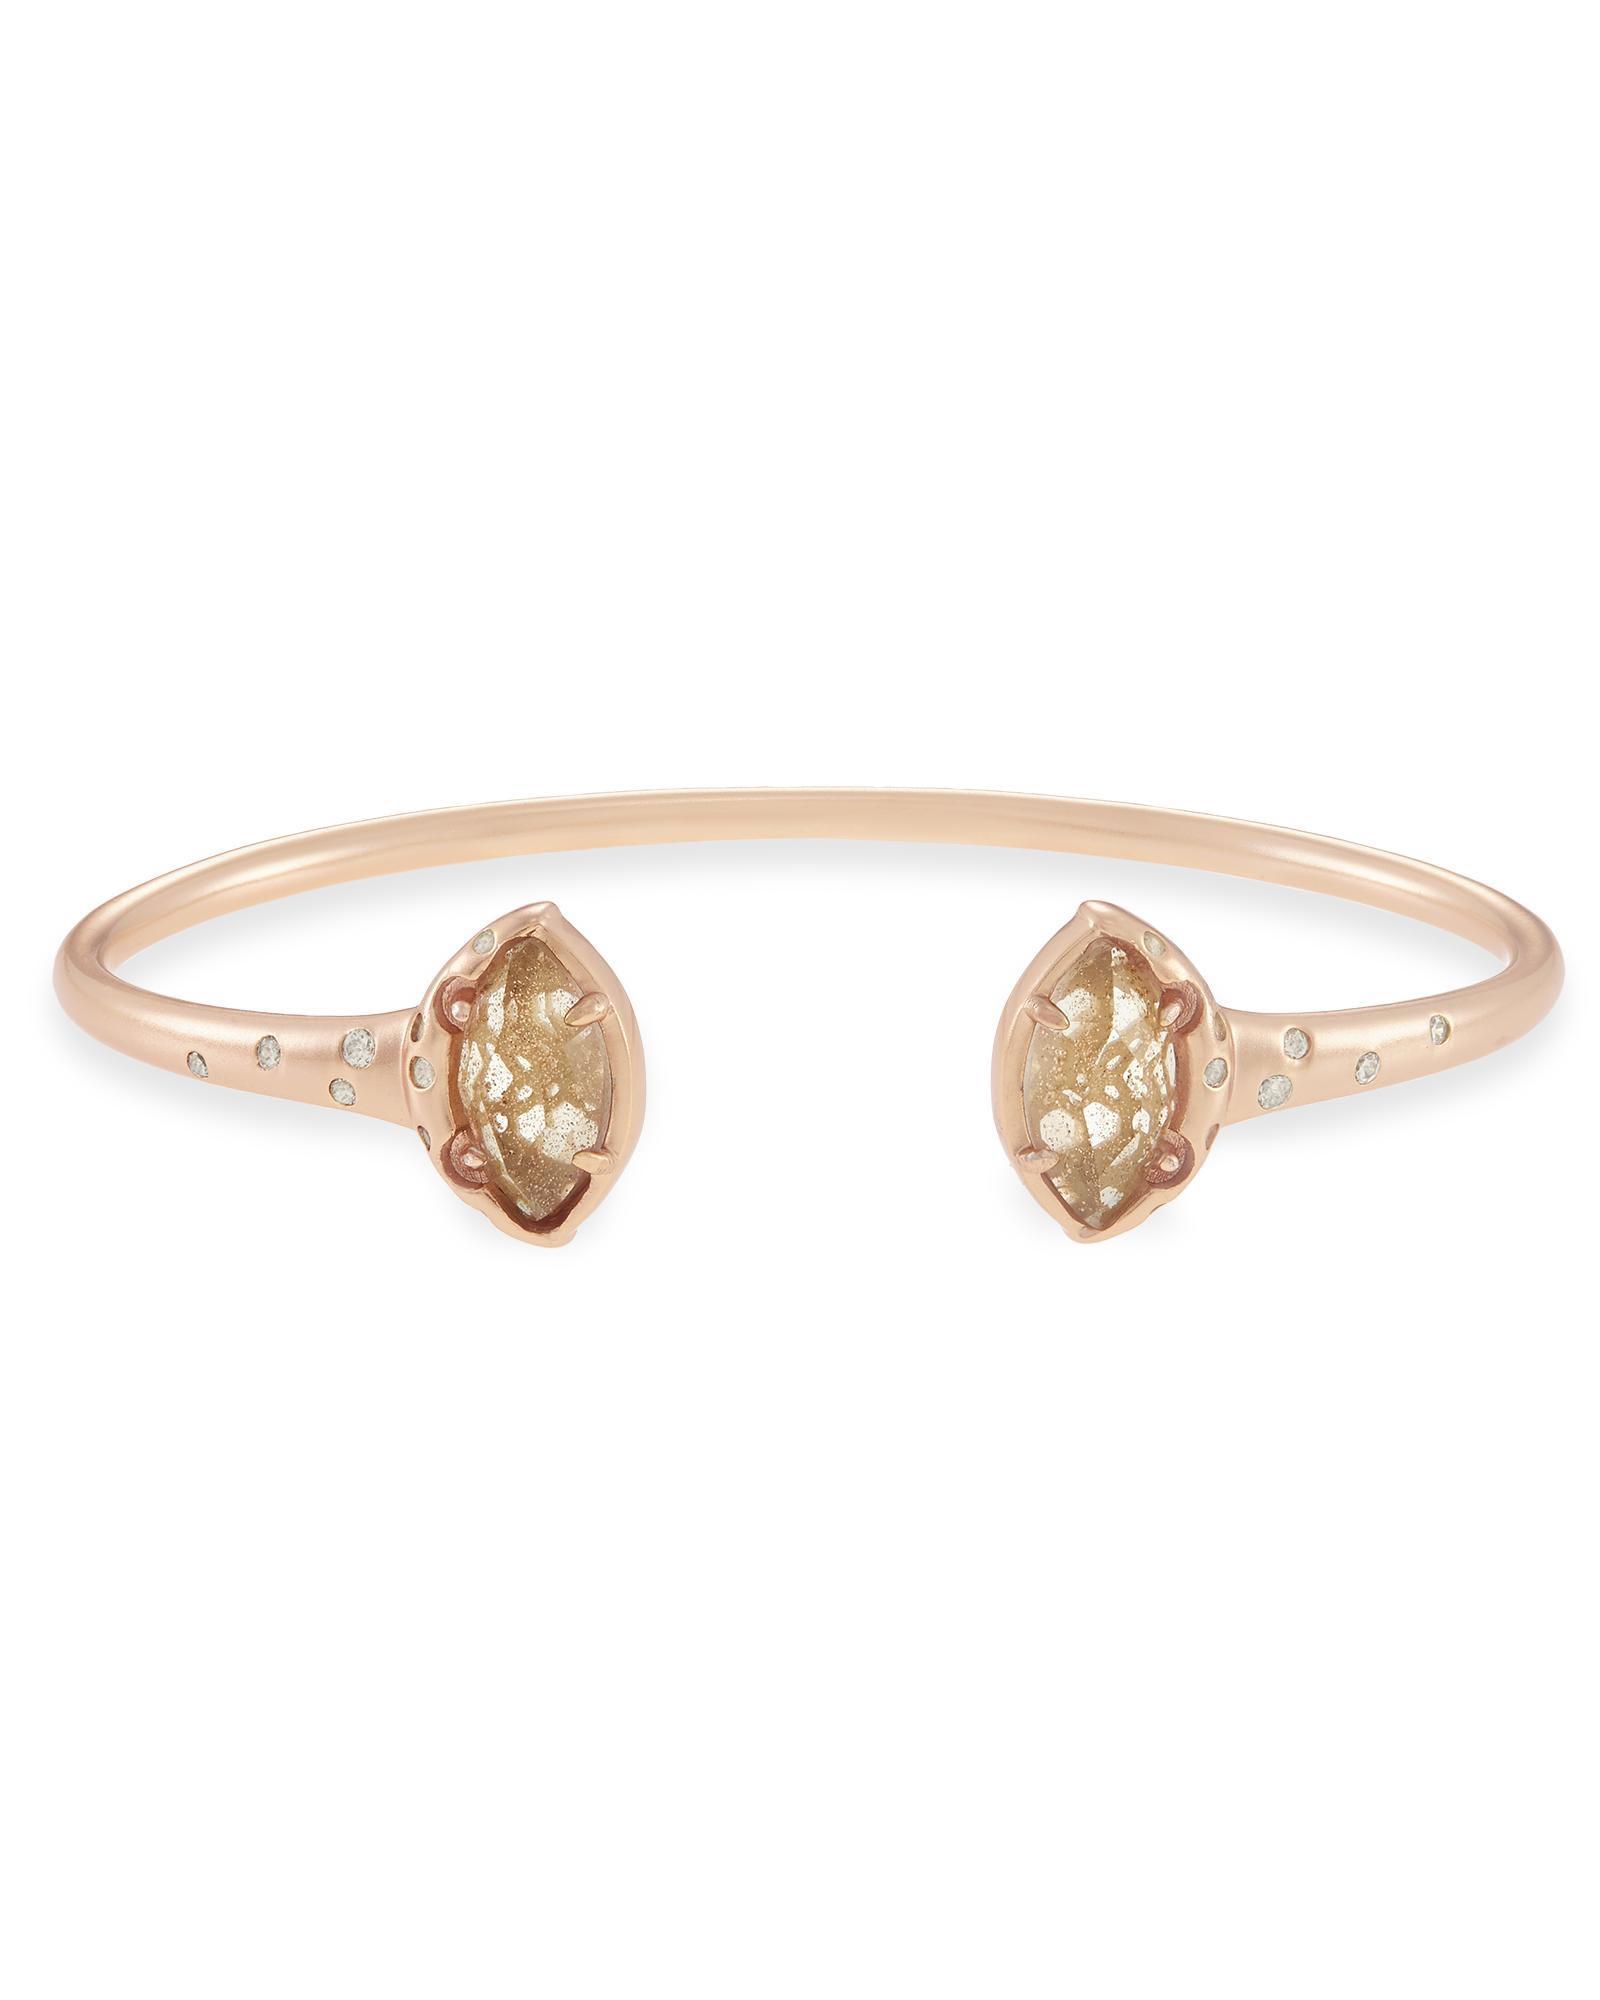 Laura Rose Gold Cuff Bracelet in Dusted Gold Kendra Scott